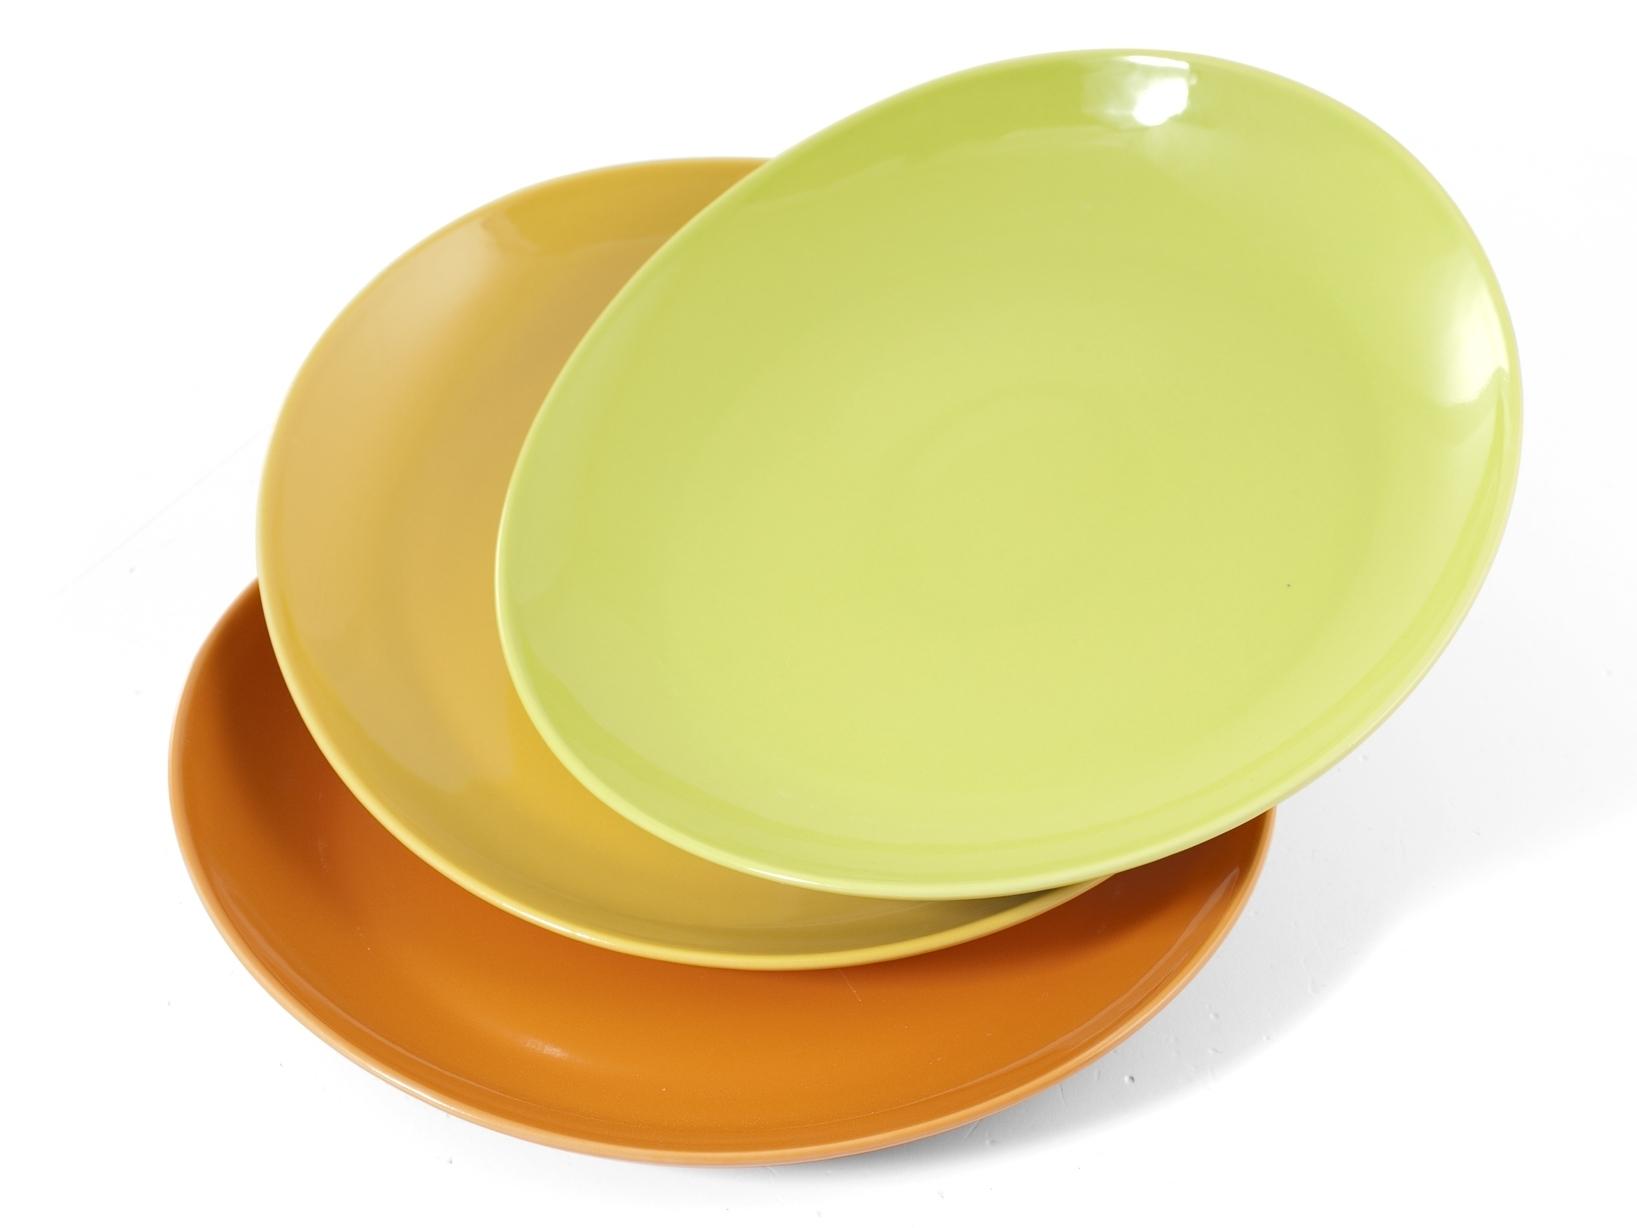 Buy Set 6 Dishes Porcelain Steak 3 30 17344319   Italy2Us.com